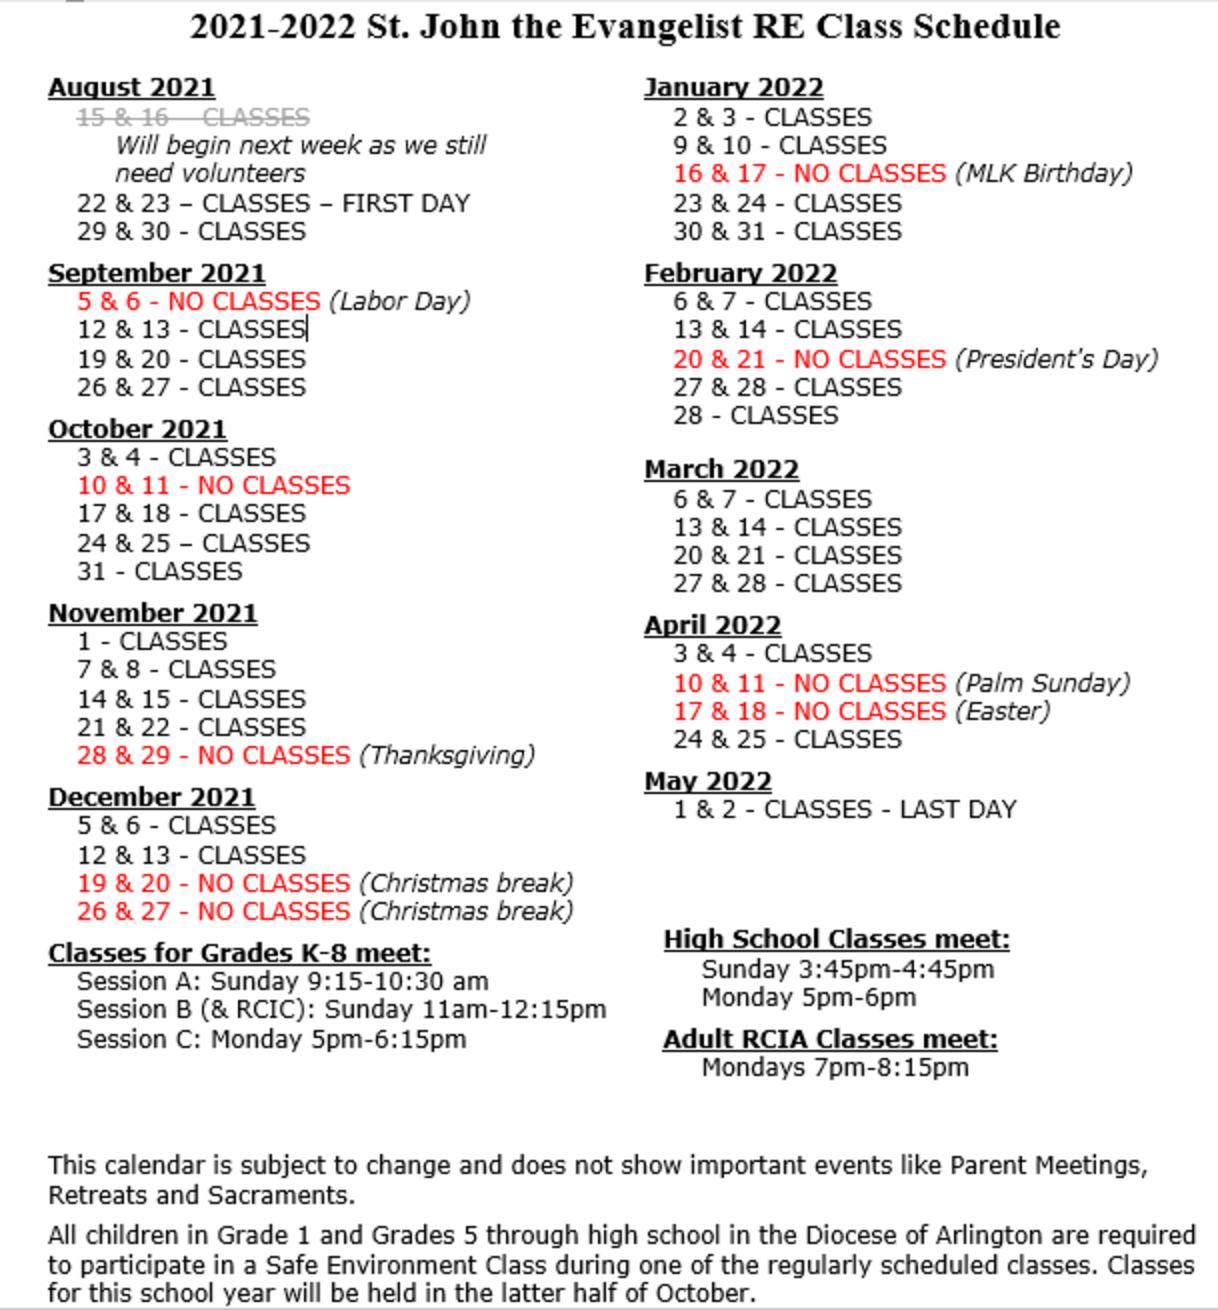 Sje Re 2021 2022 Class Calendar Updated